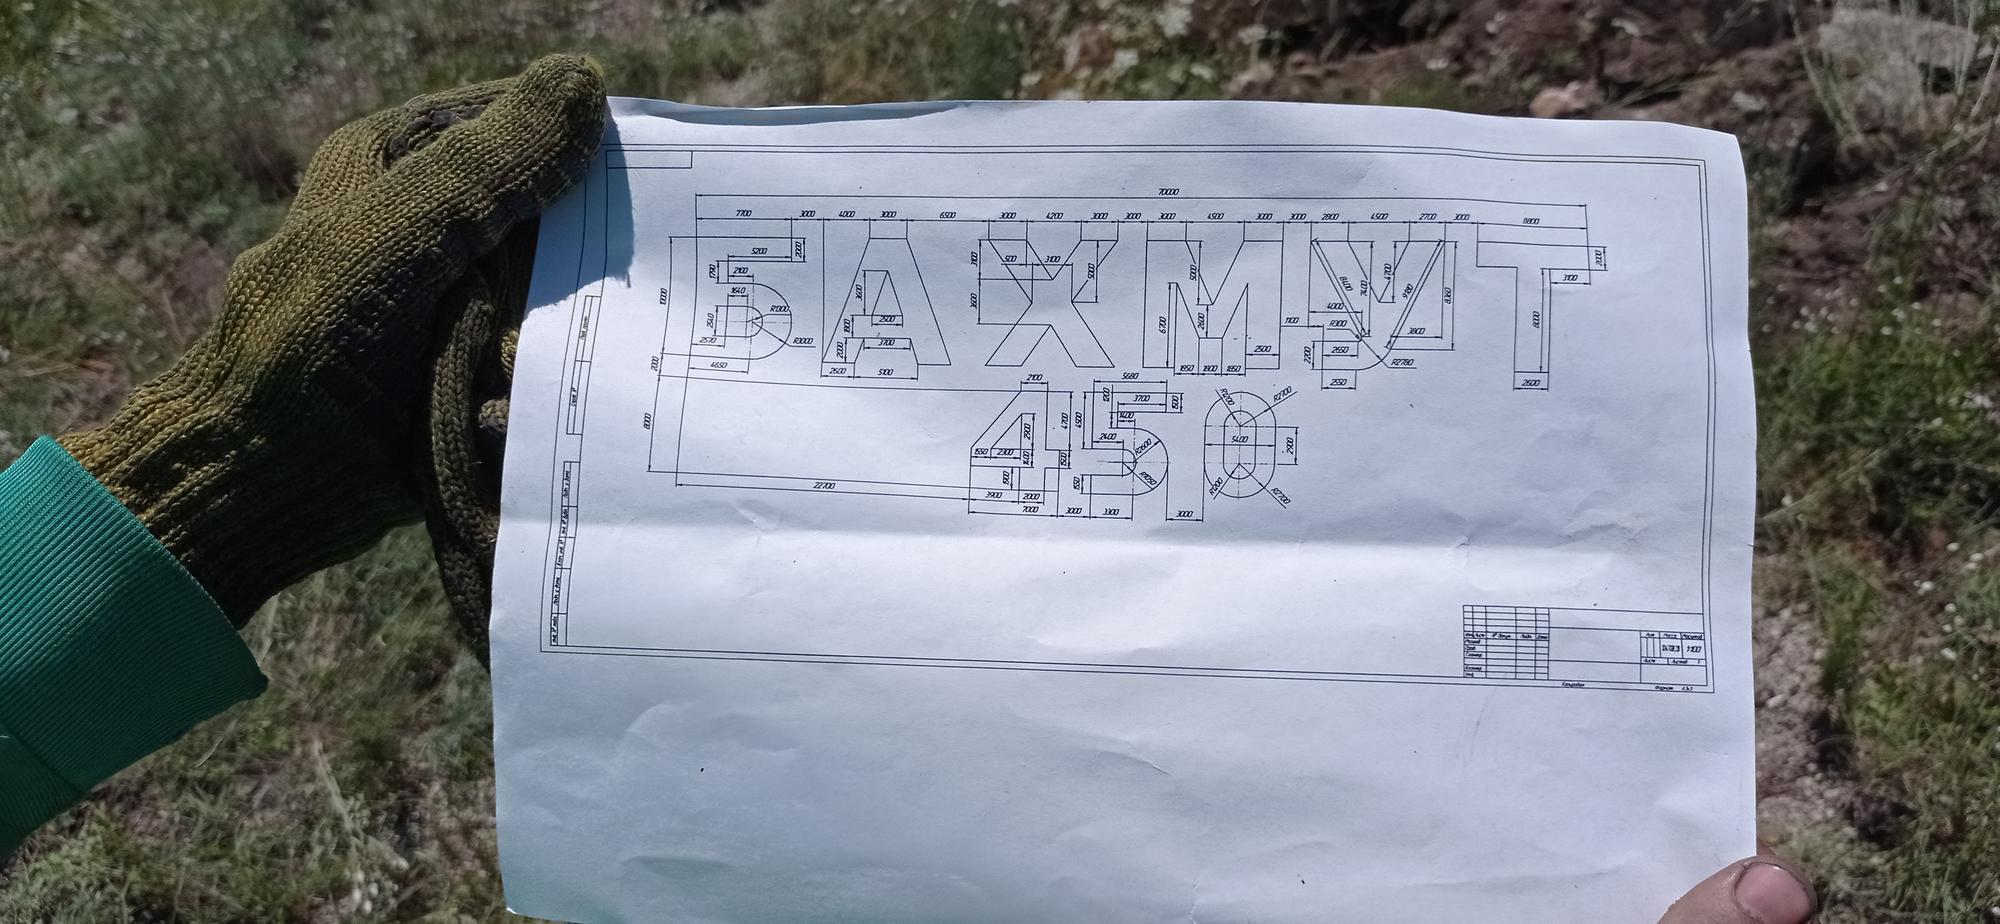 чертеж Бахмут 450 буквы к юбилею города